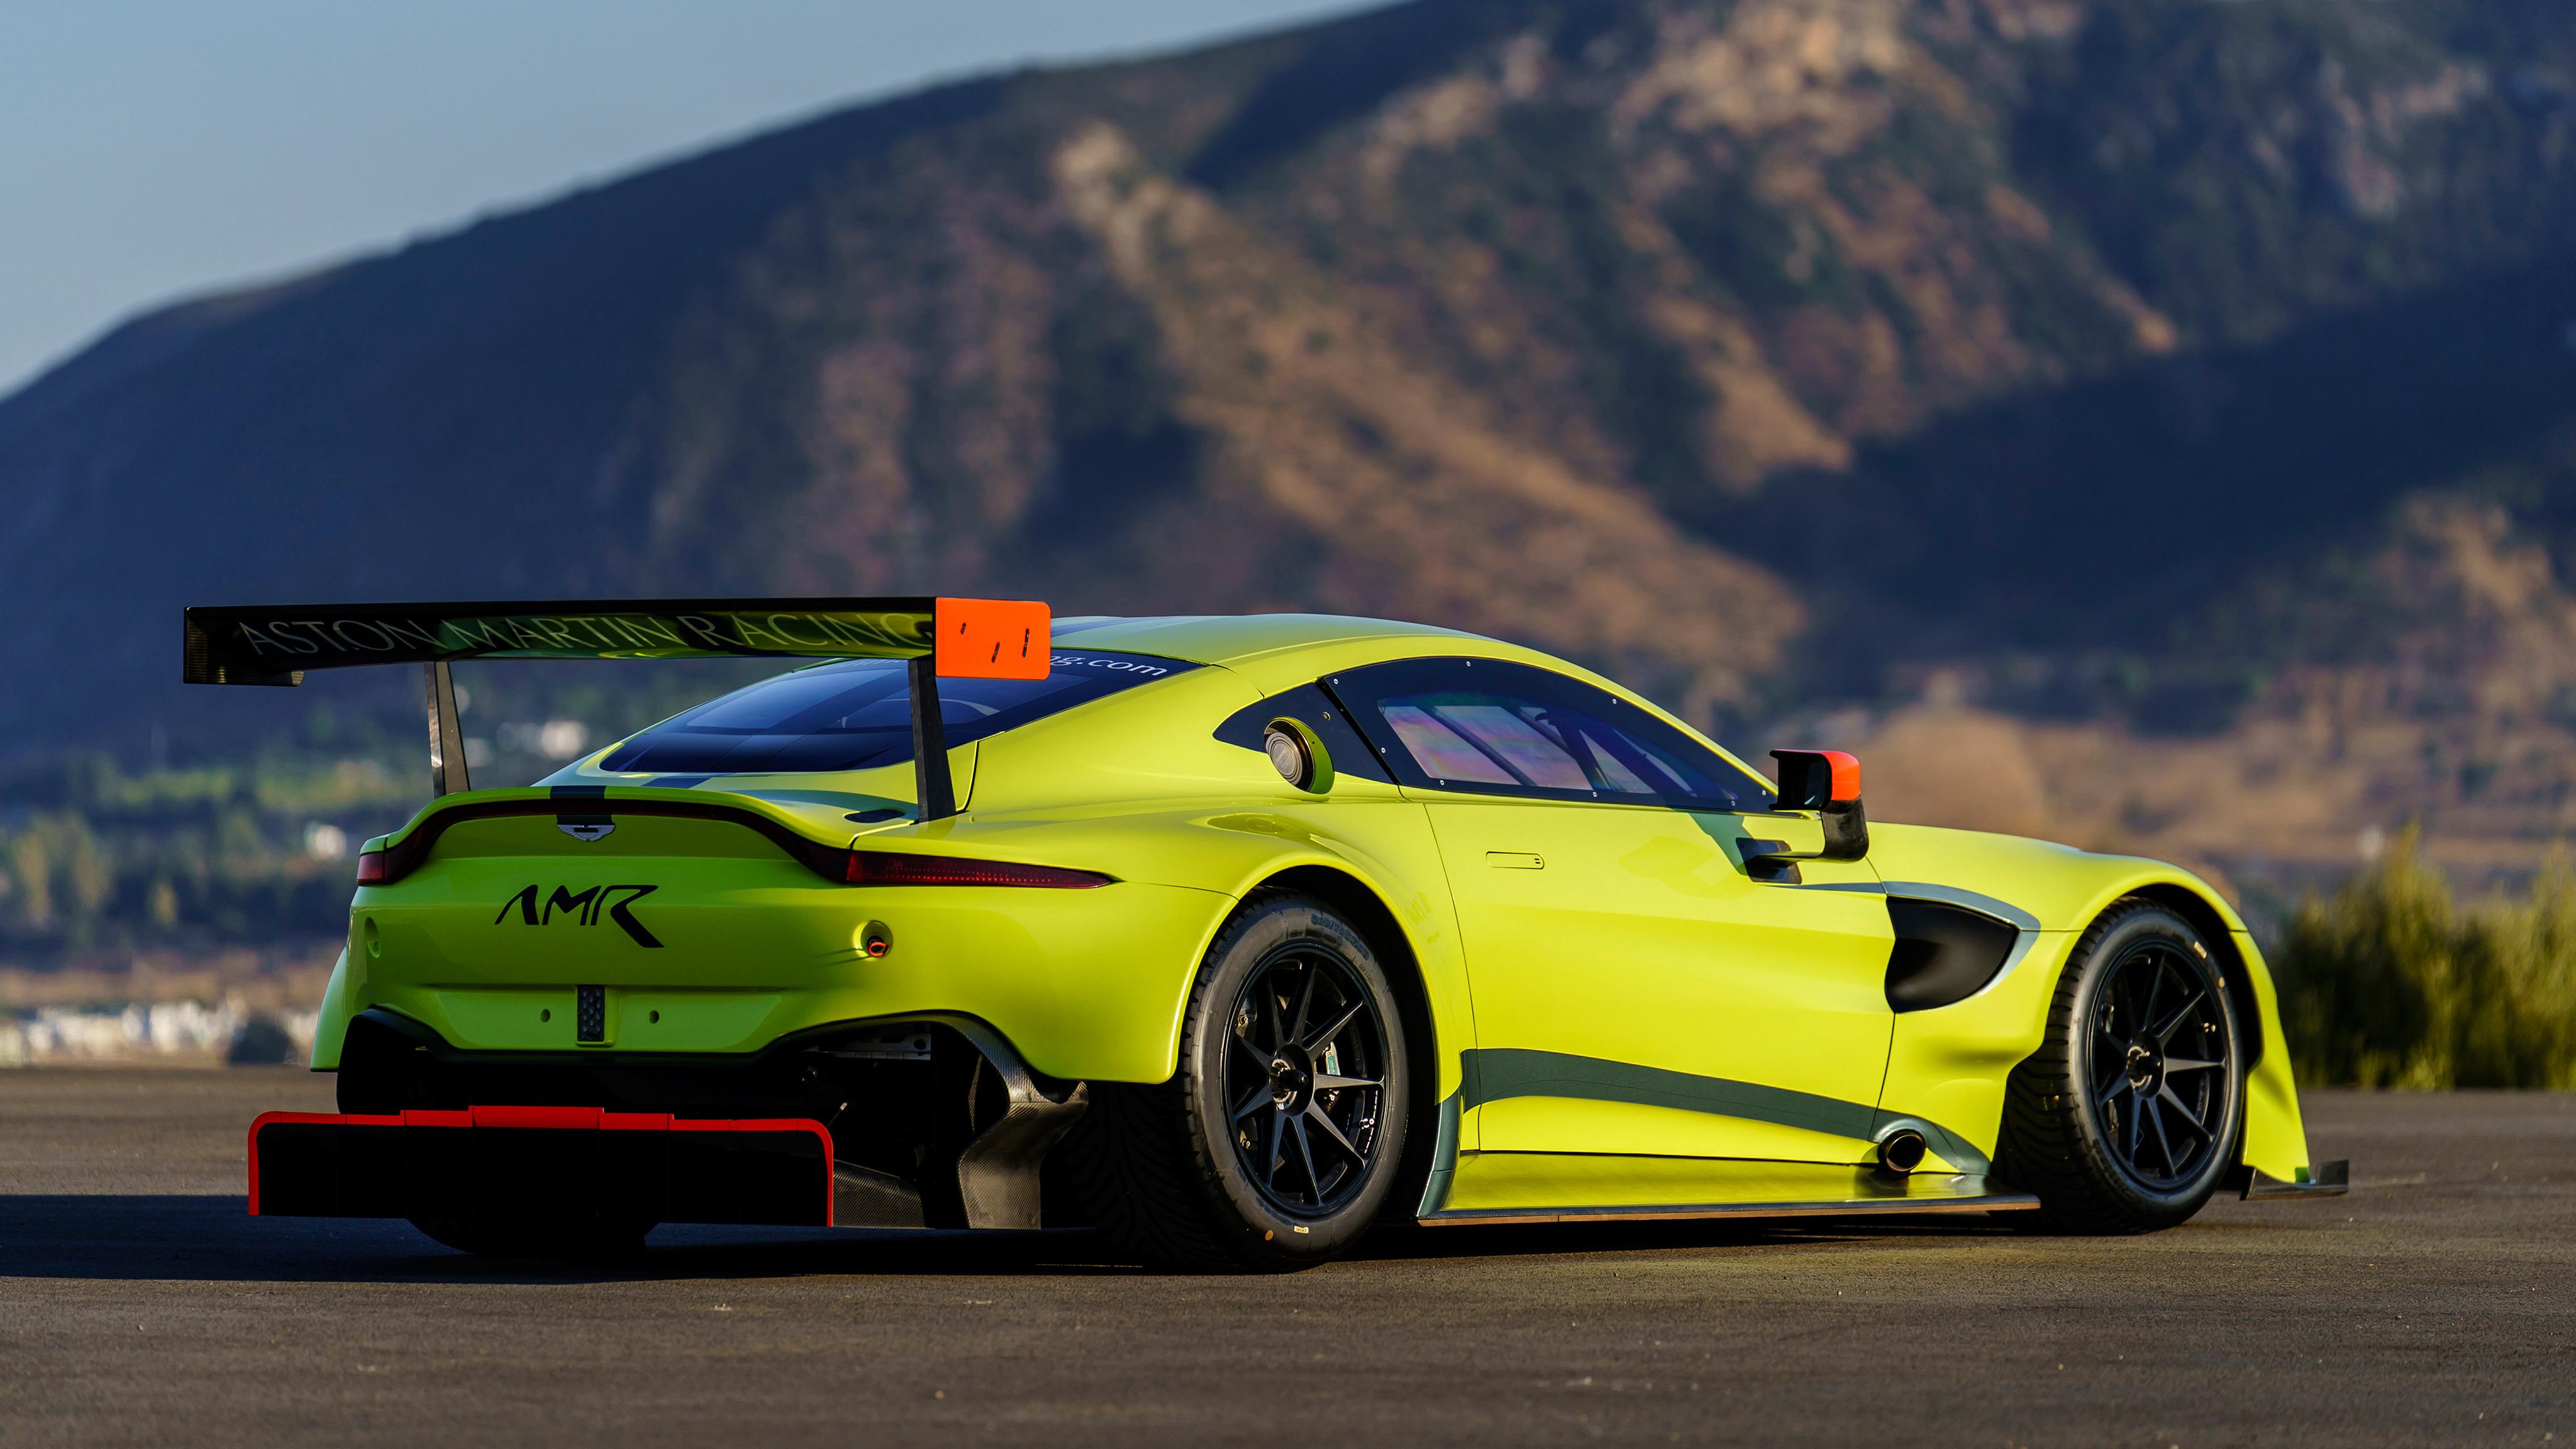 2018 Aston Martin Vantage Gte 4k 7 Wallpaper Hd Car Wallpapers Id 9156